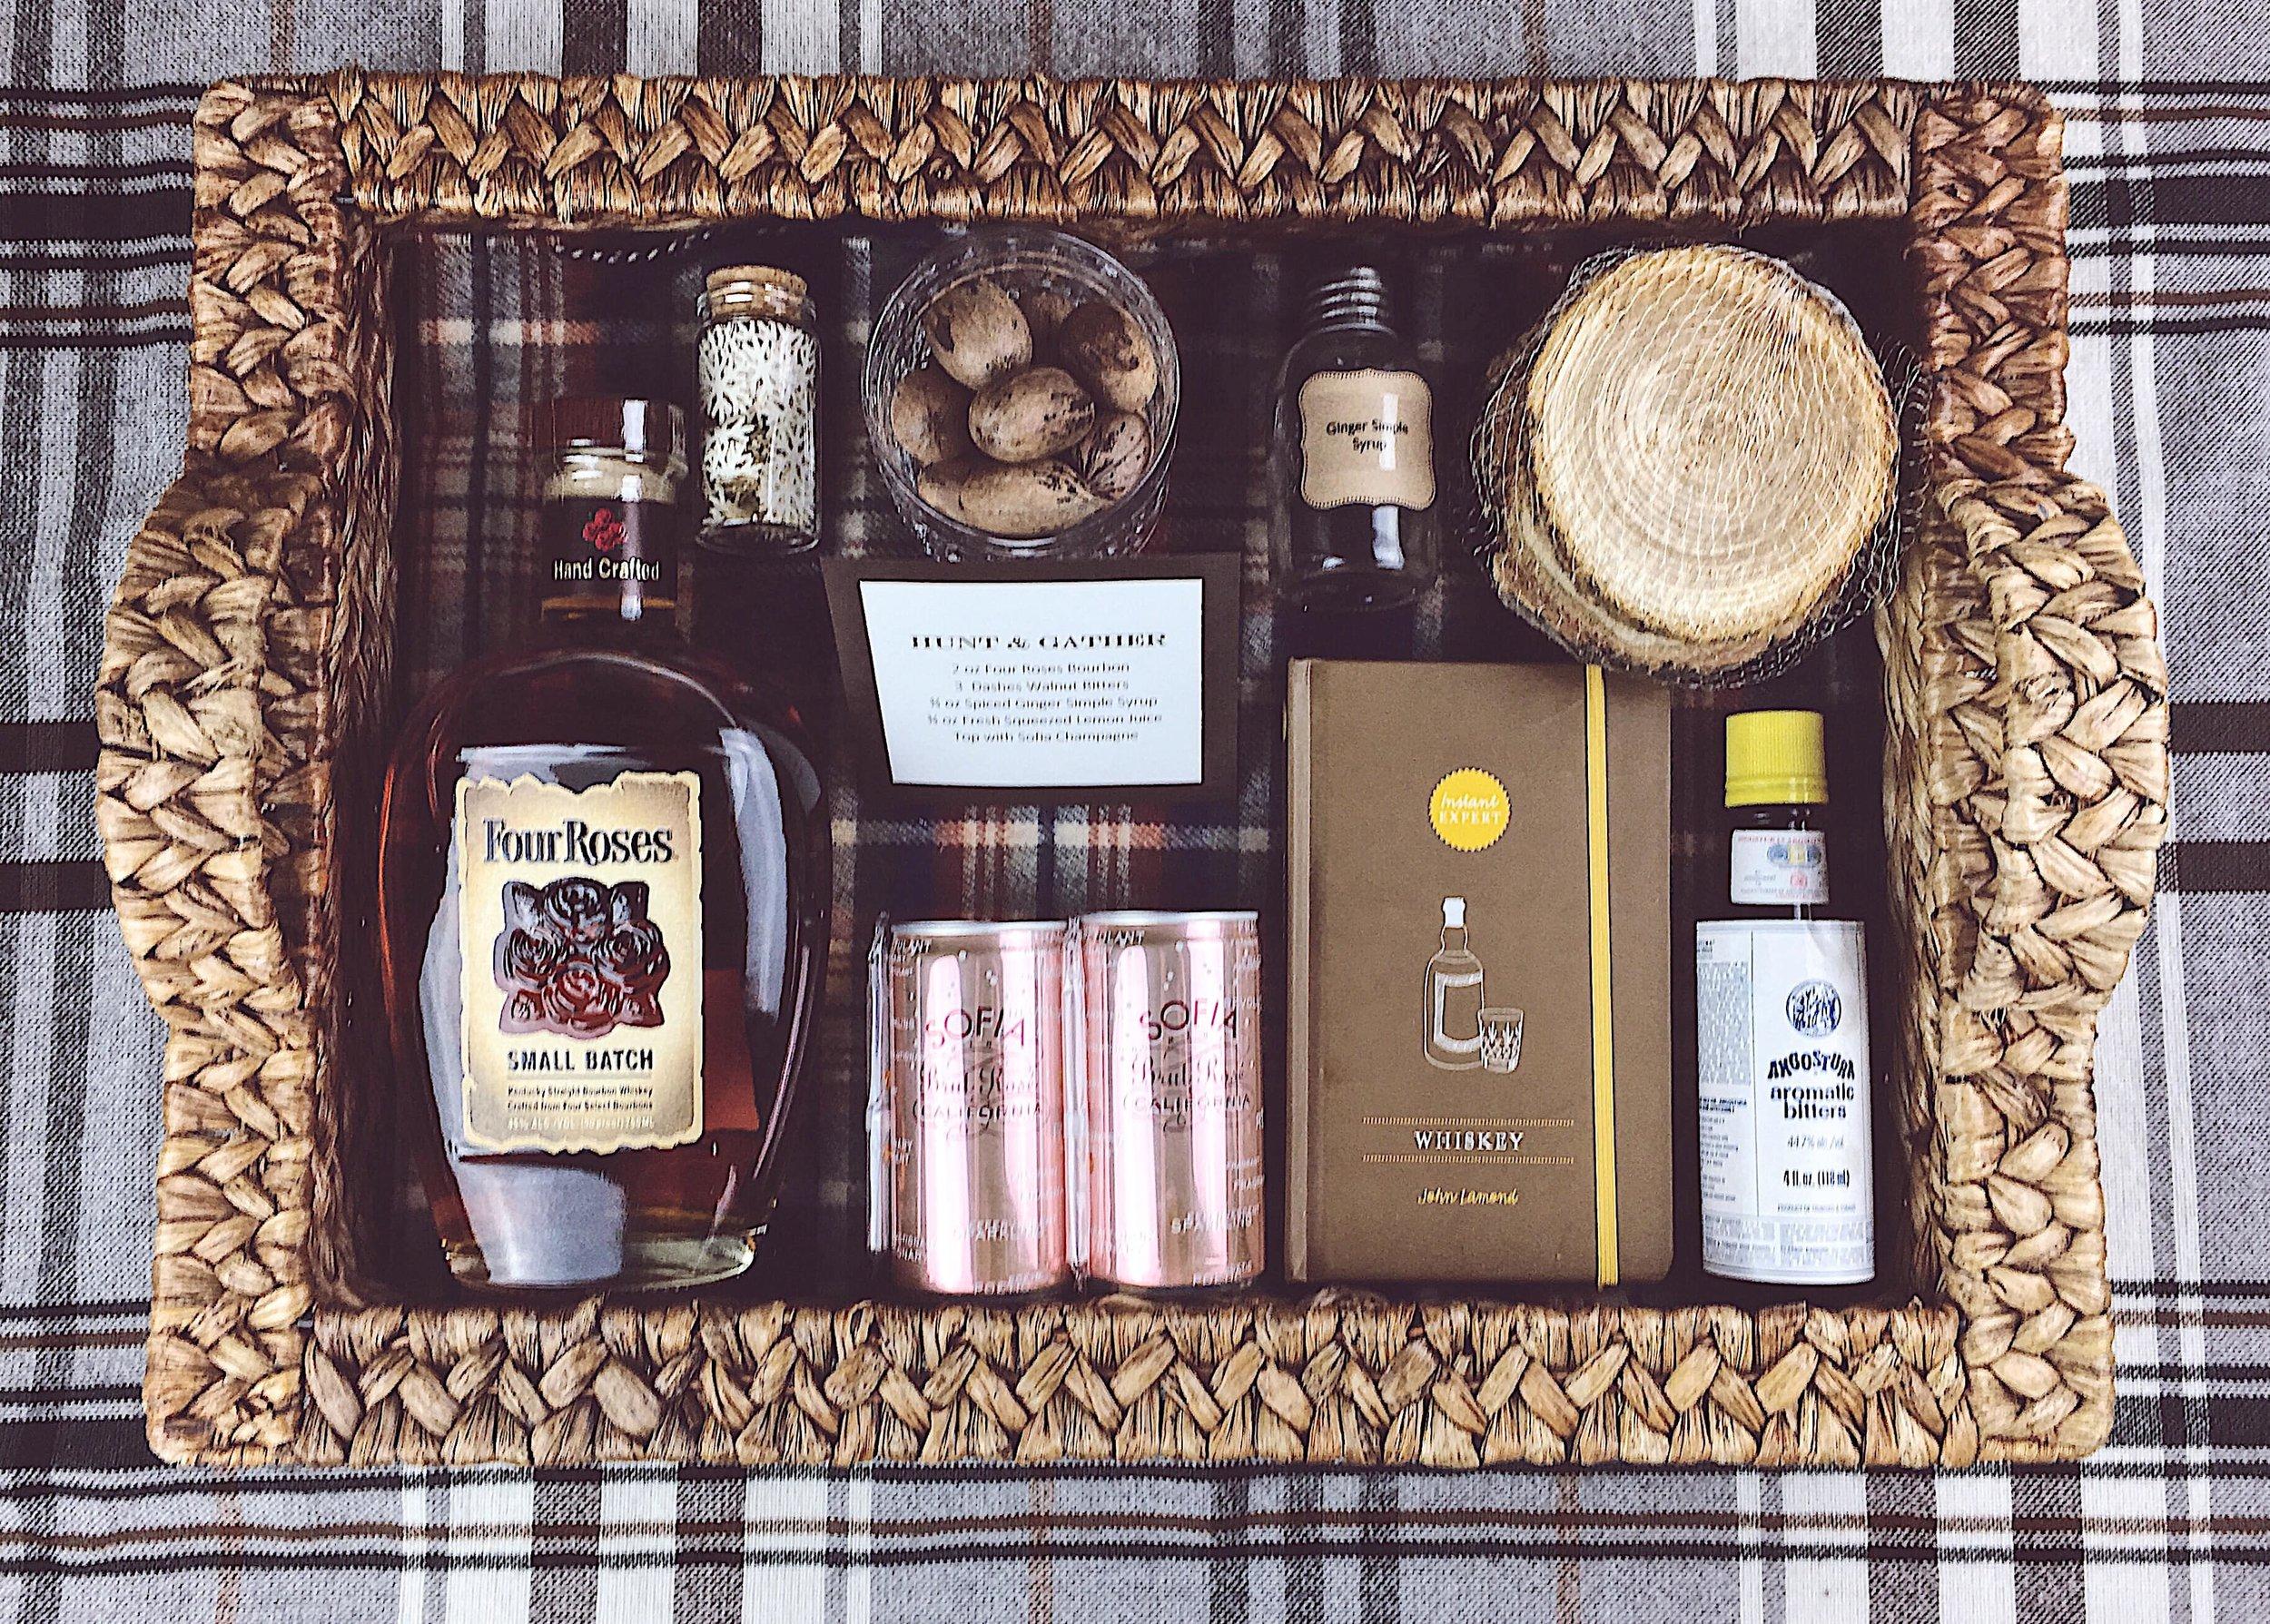 lakehouse-house-gift.j[g